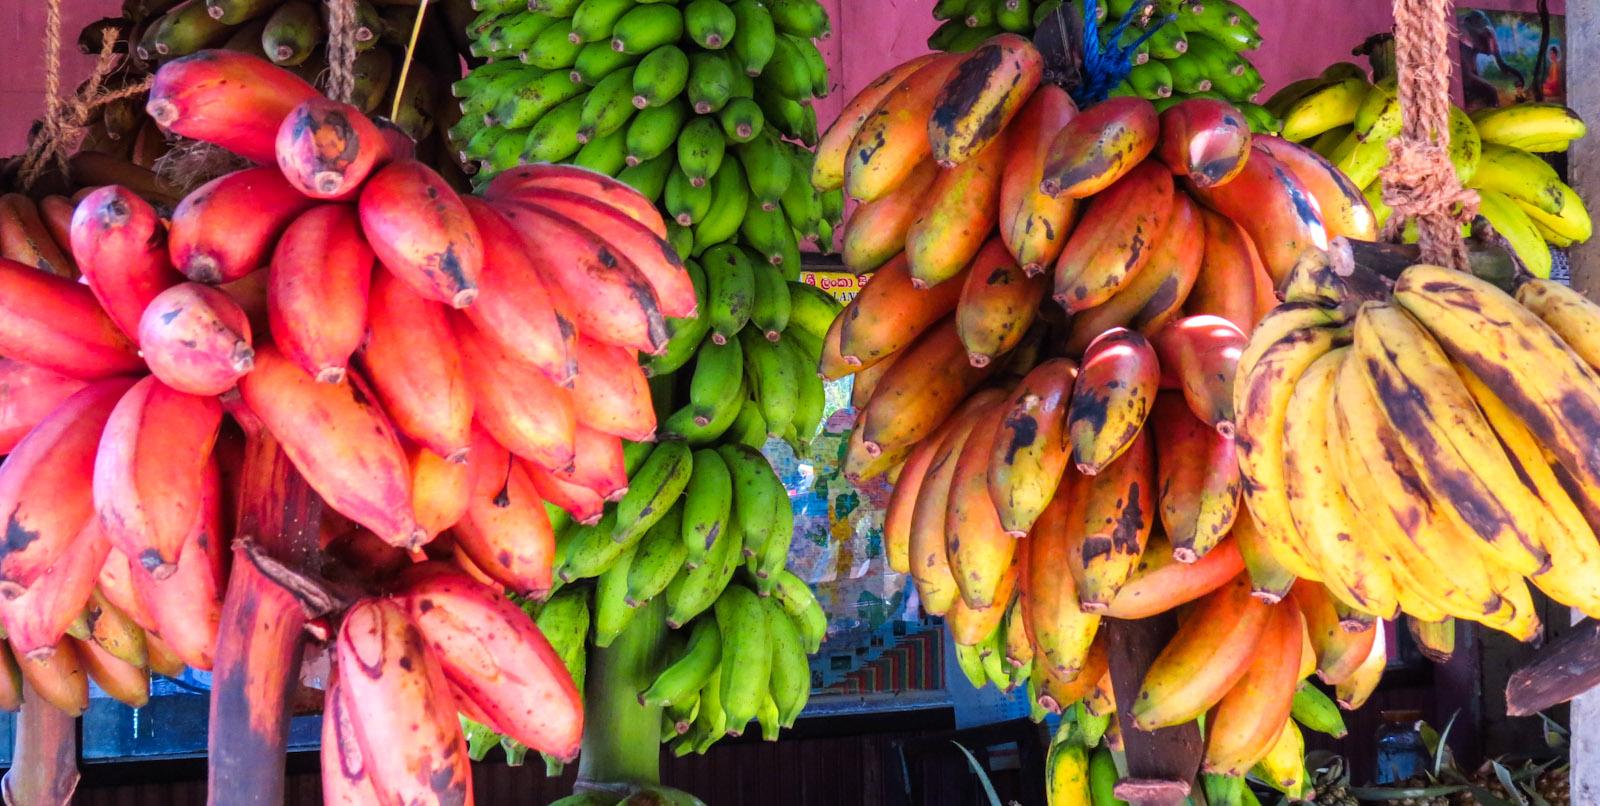 Red Bananas – Kandy, Sri Lanka